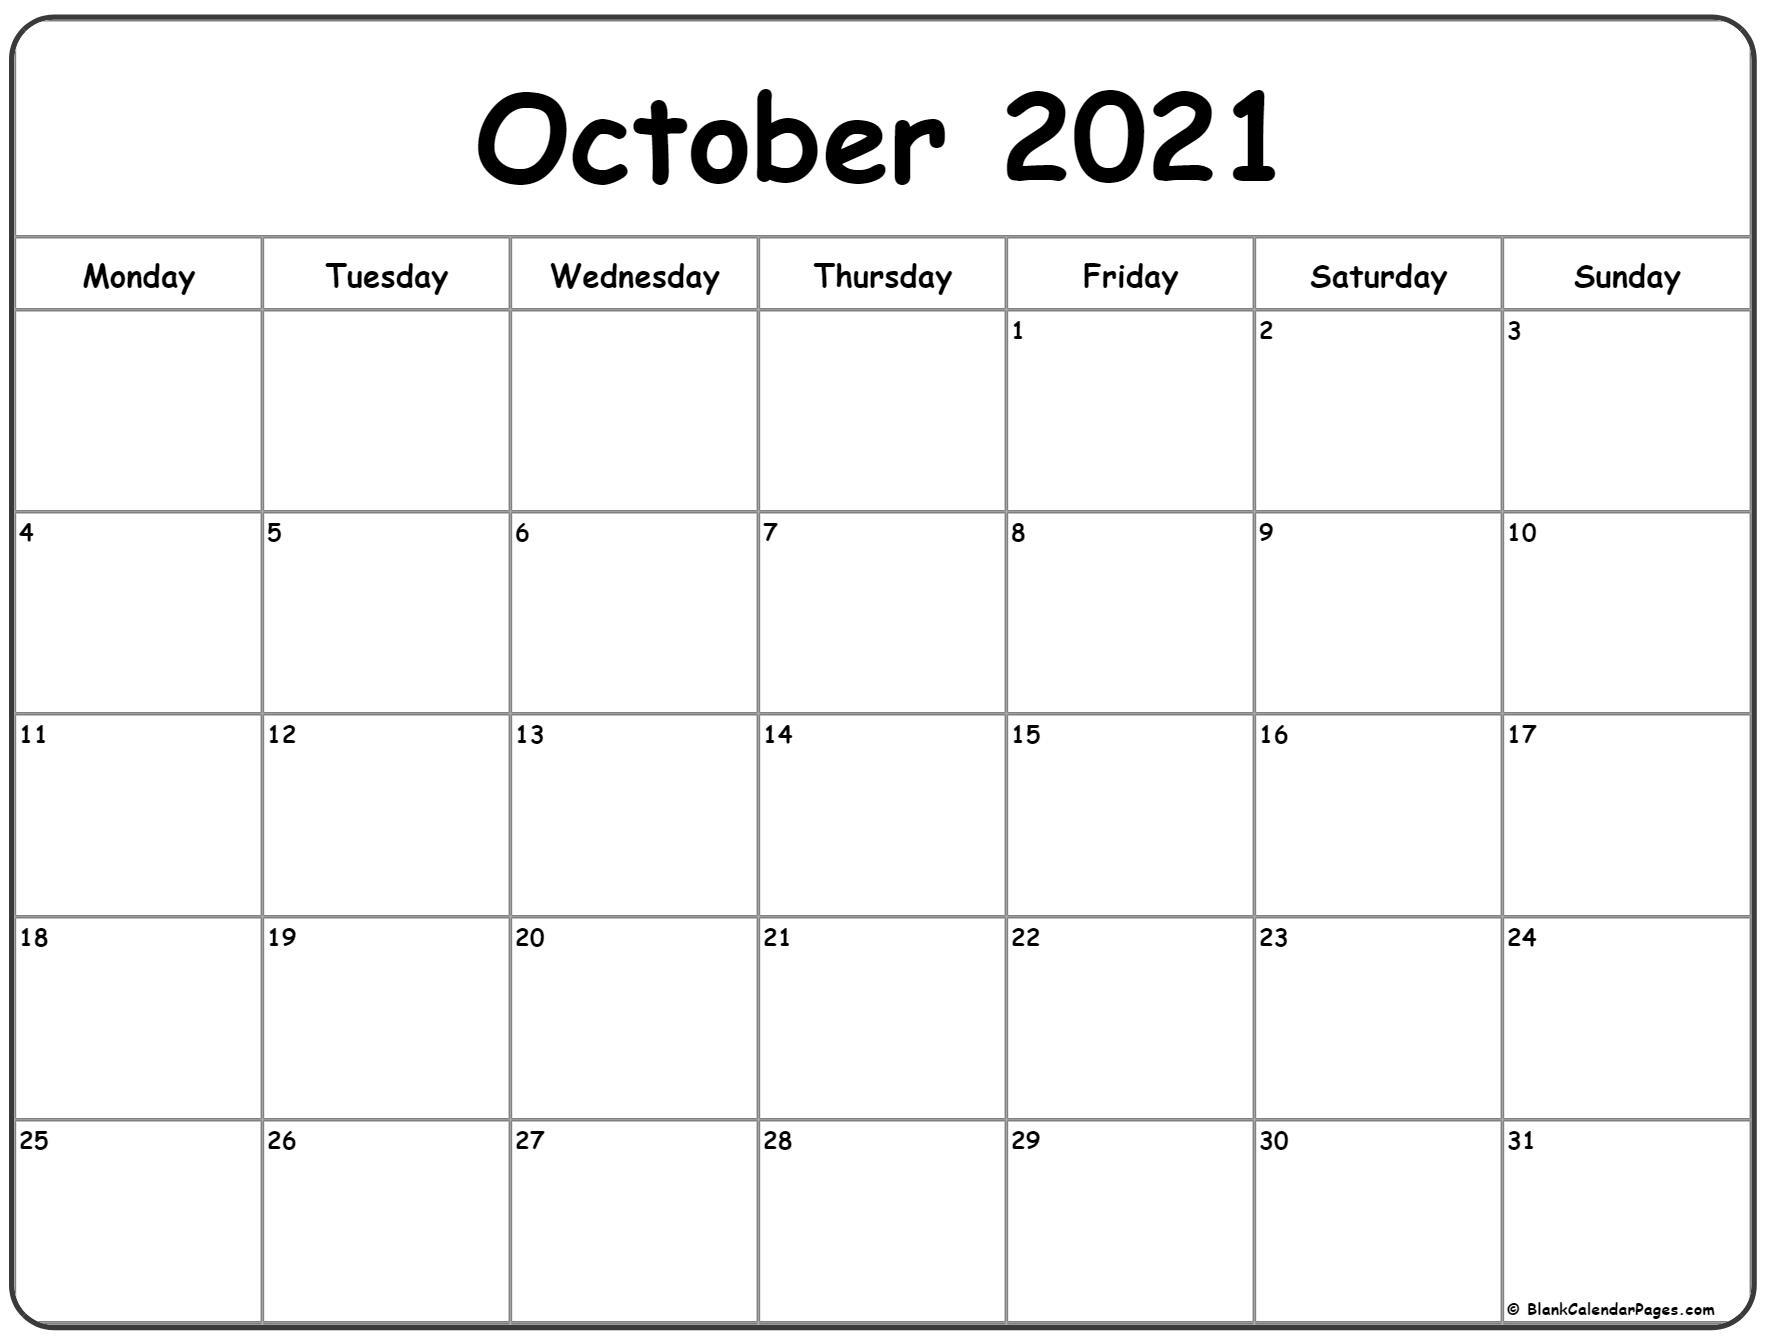 October 2021 Monday Calendar | Monday To Sunday